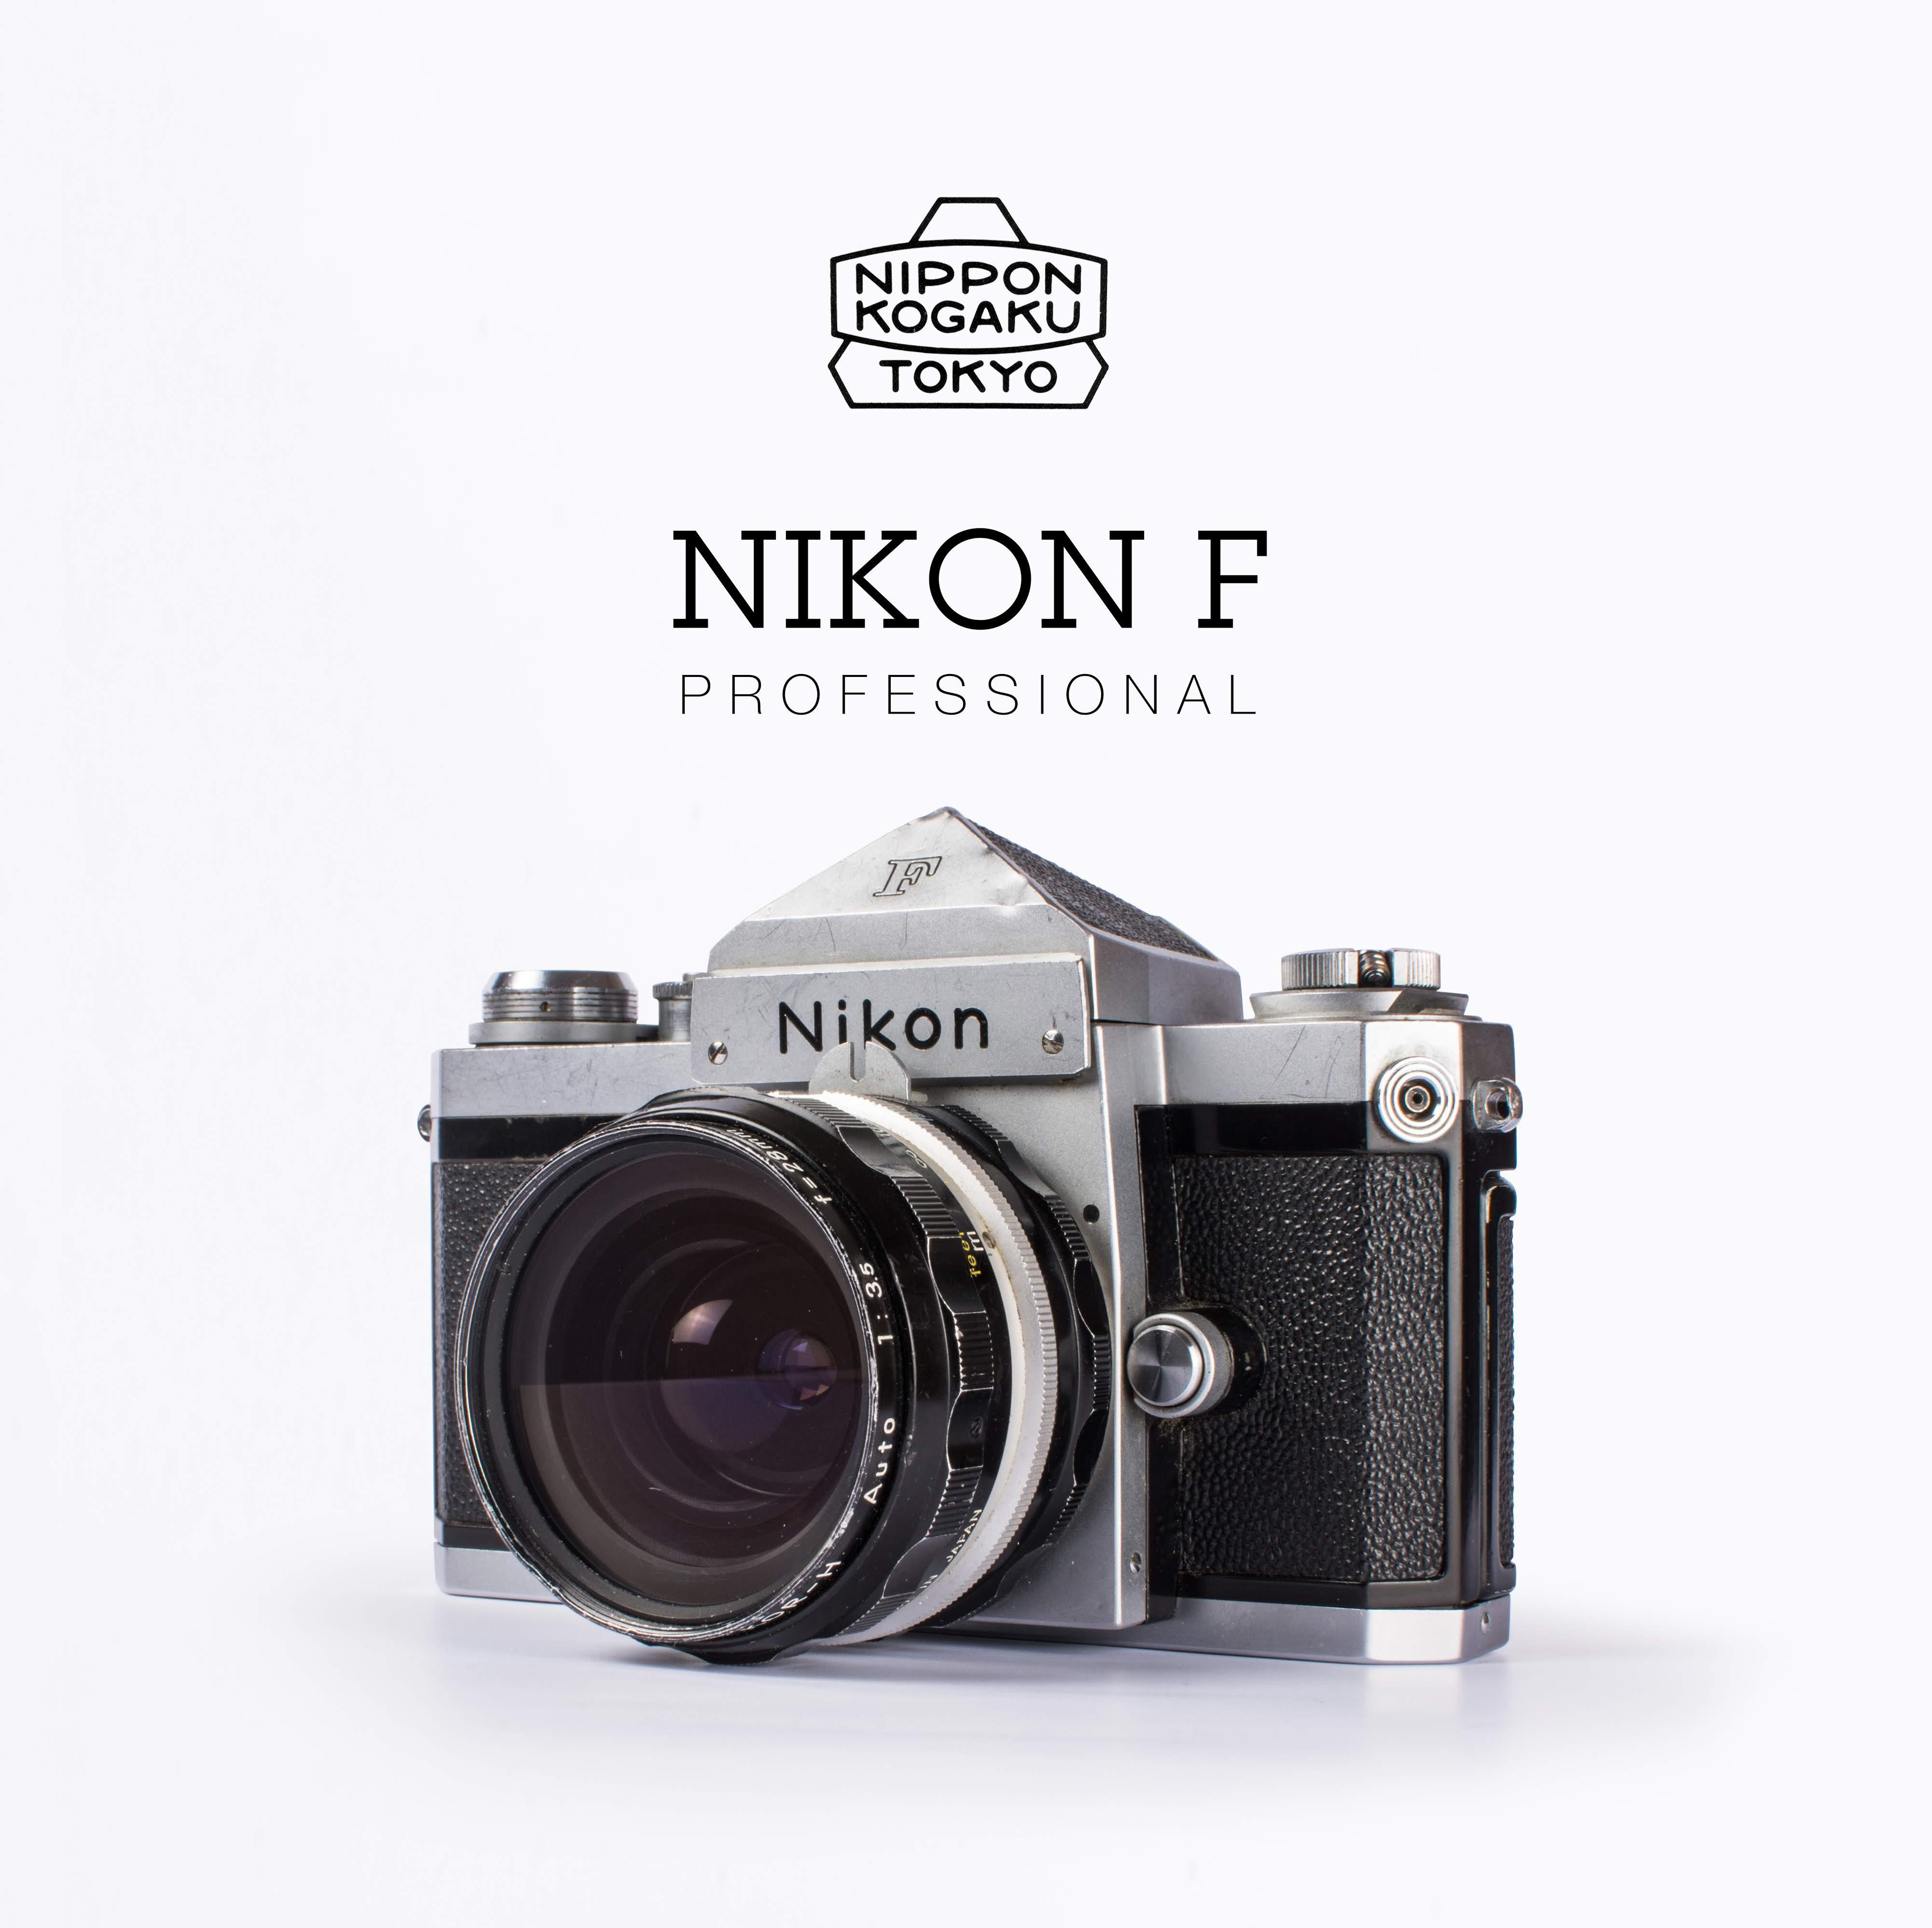 Nikon F Professional